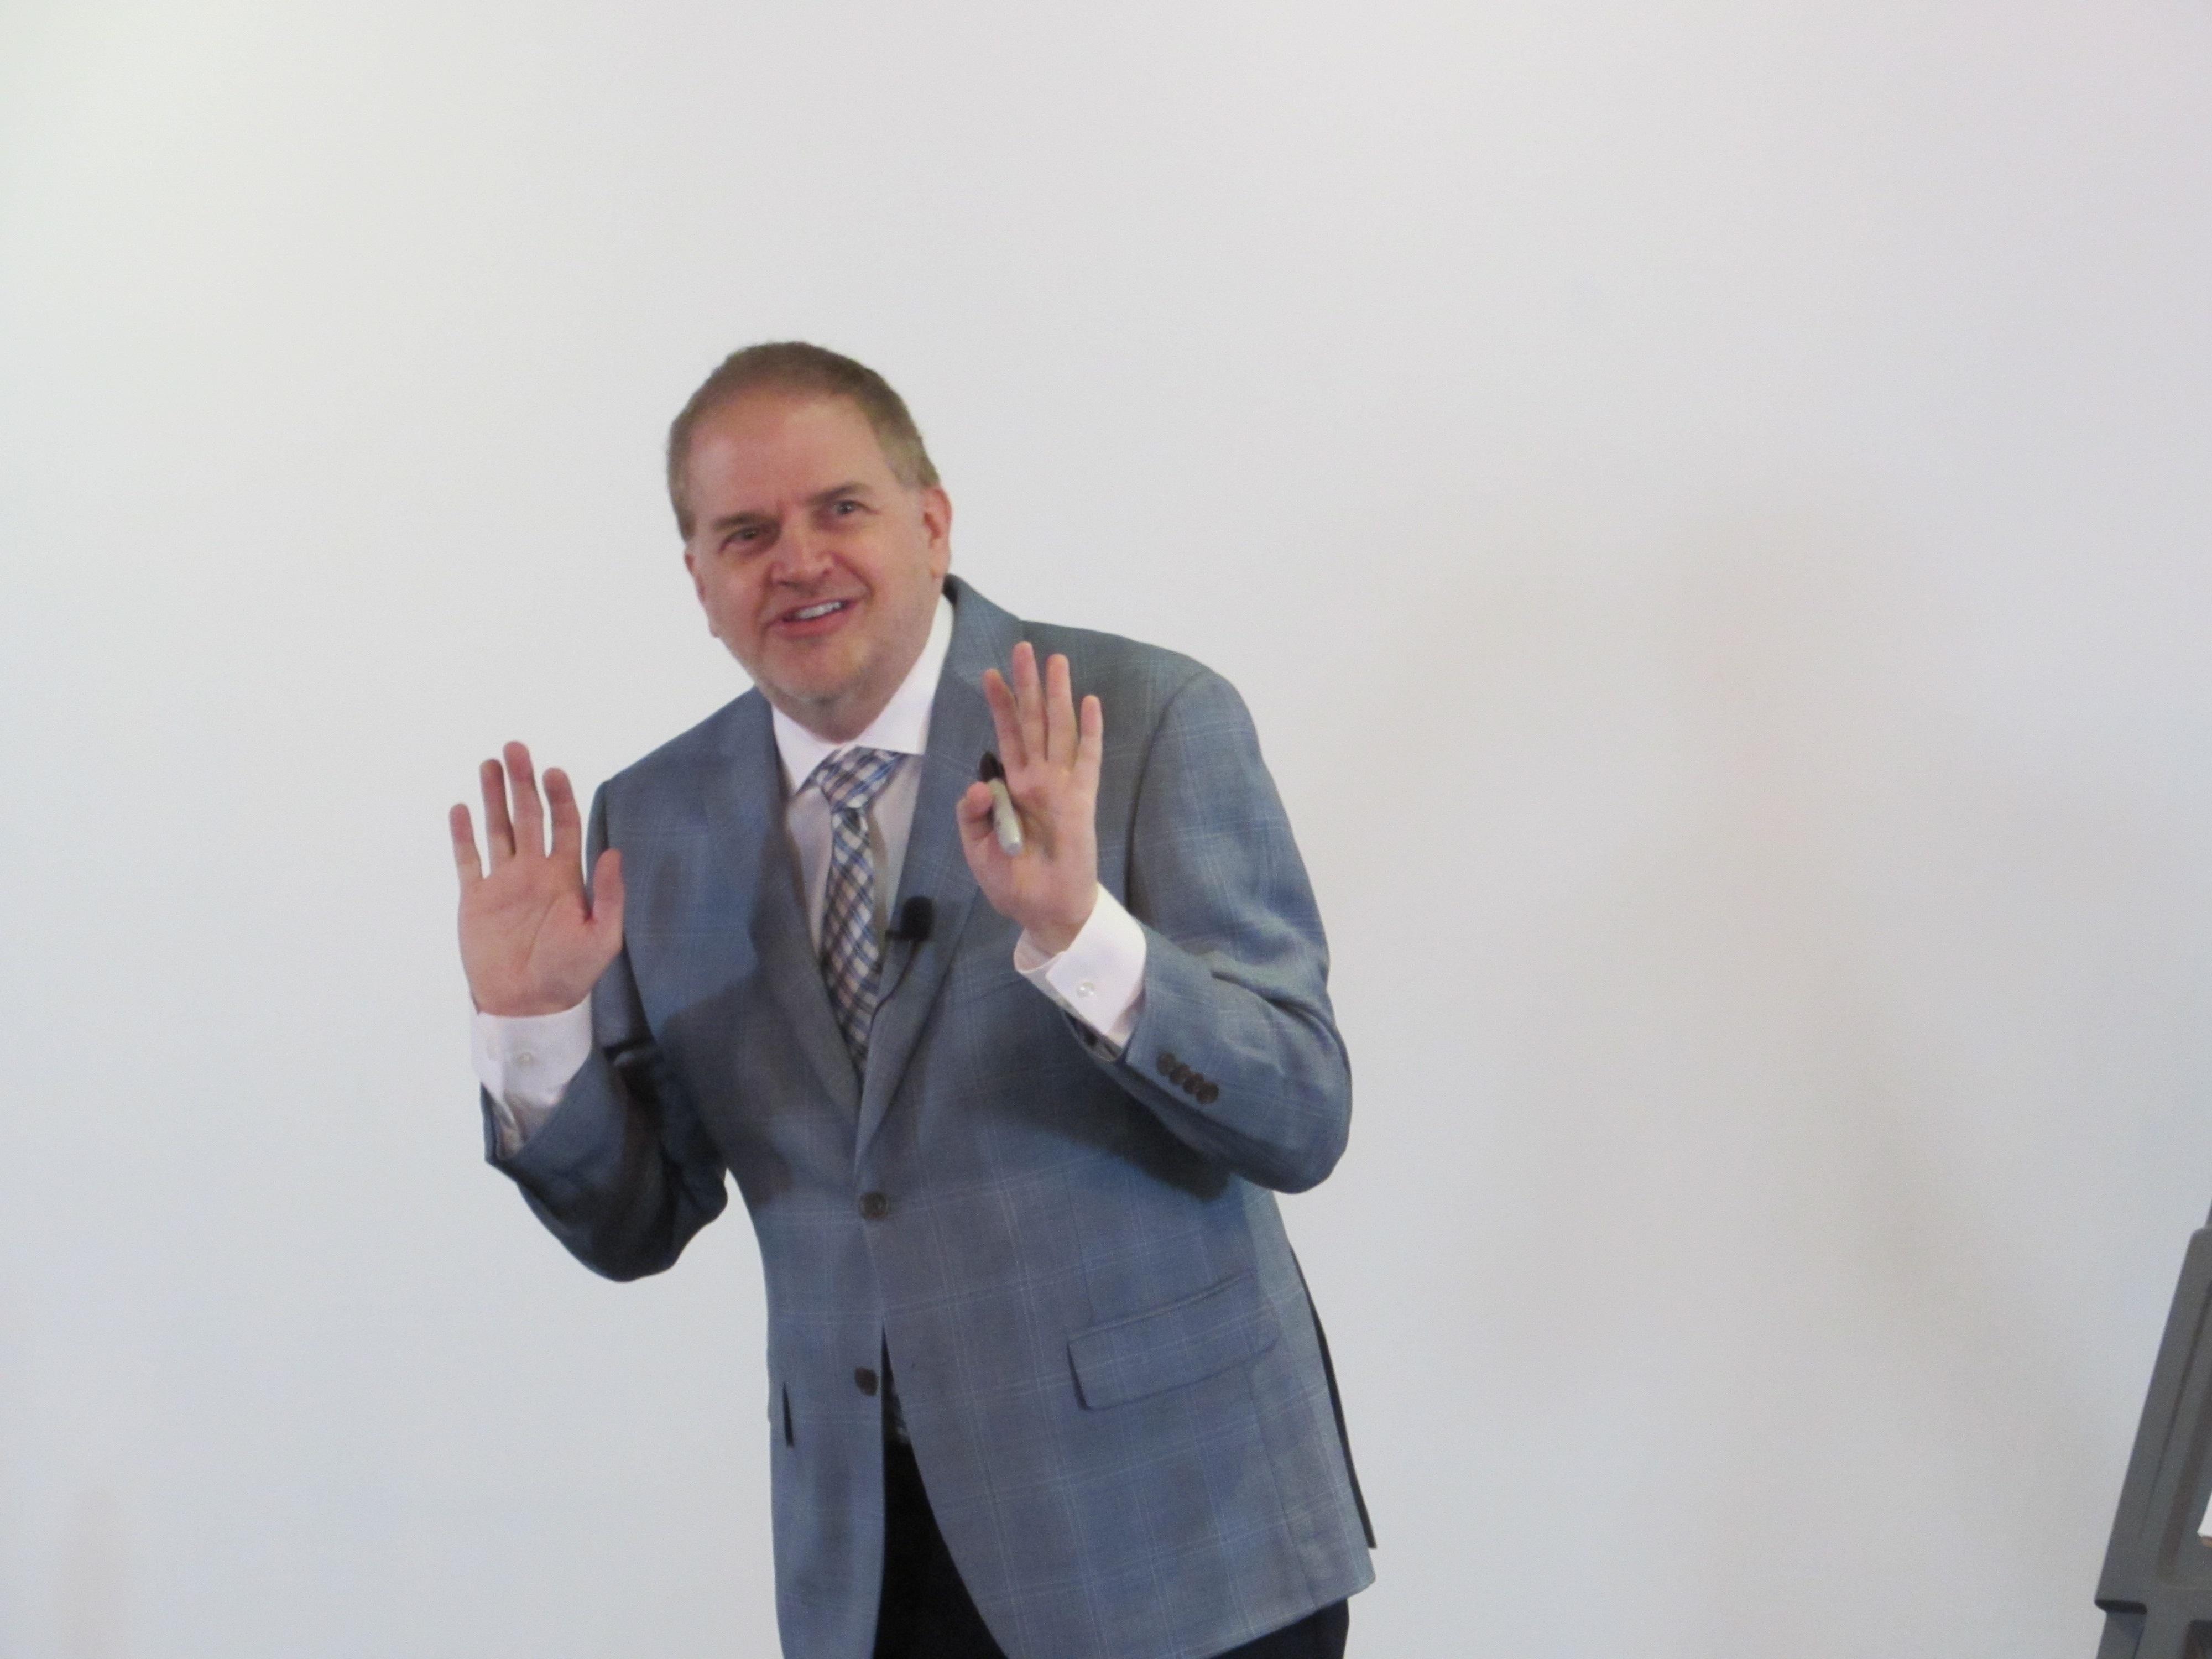 Kevin Hogan teaches Scientific Brainstorming